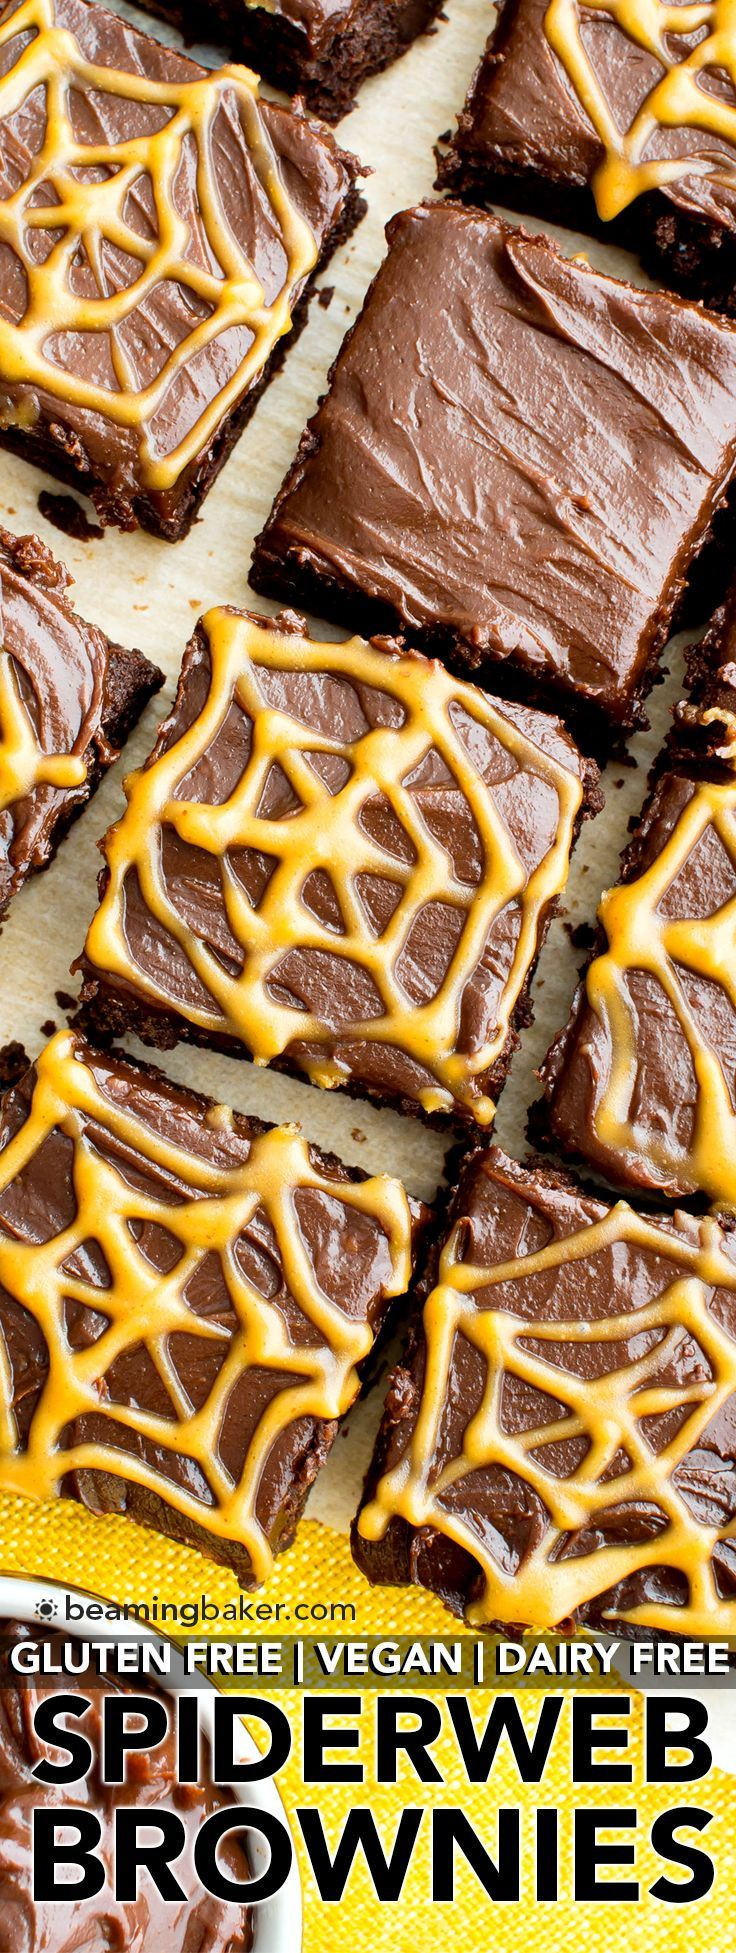 Chocolate Peanut Butter Spiderweb Brownies (V, GF, DF): a spooky Halloween recipe for decadently rich brownies covered in peanut butter spiderwebs! #Vegan #GlutenFree #DairyFree   http://BeamingBaker.com